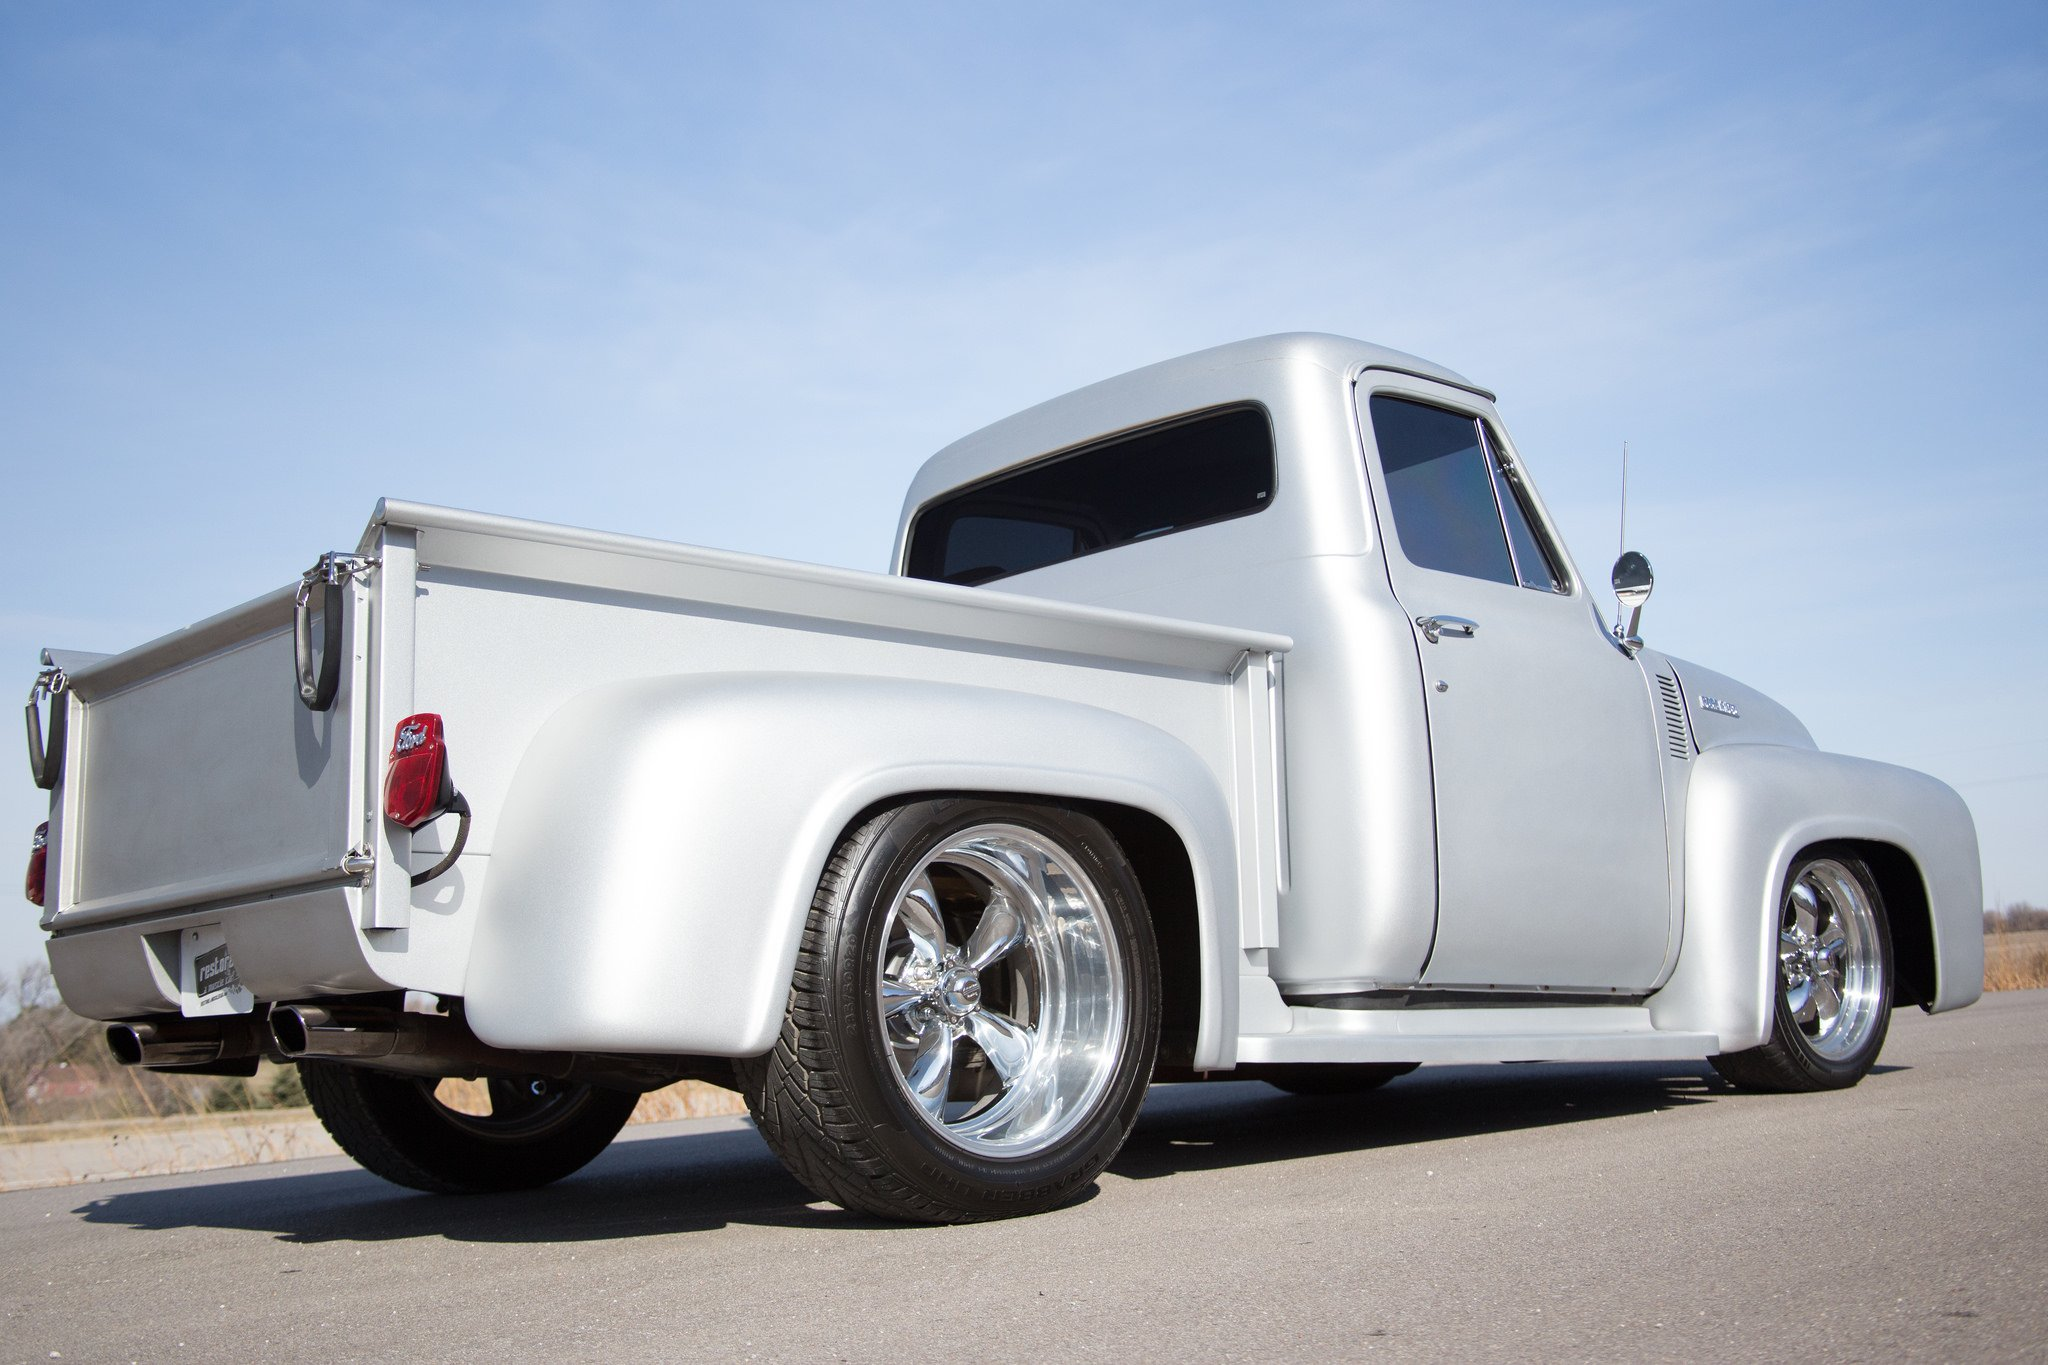 1954 Ford F100 Custom Cars Pickup Wallpaper 2048x1365 792170 Pick Up Wallpaperup